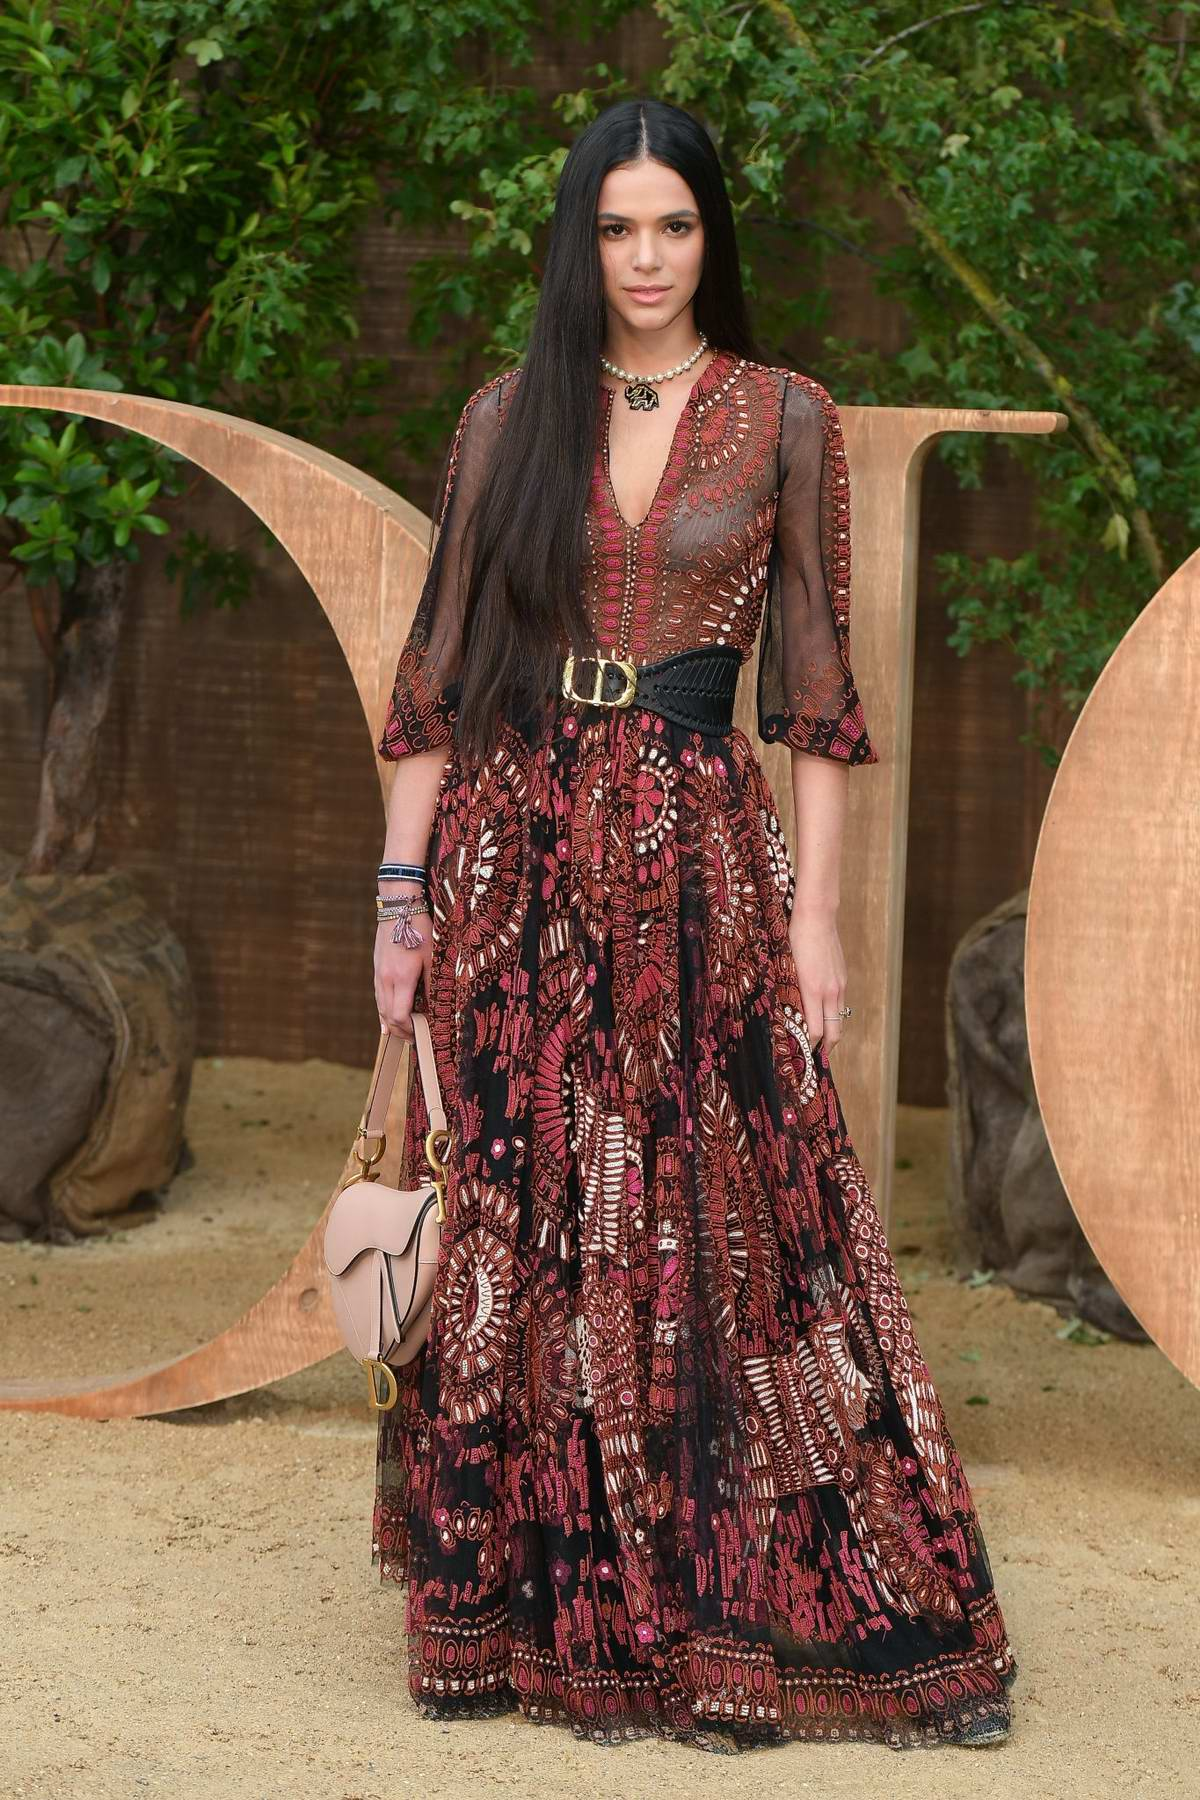 Bruna Marquezine attends Christian Dior show, Womenswear SS 2020 during Paris Fashion Week in Paris, France